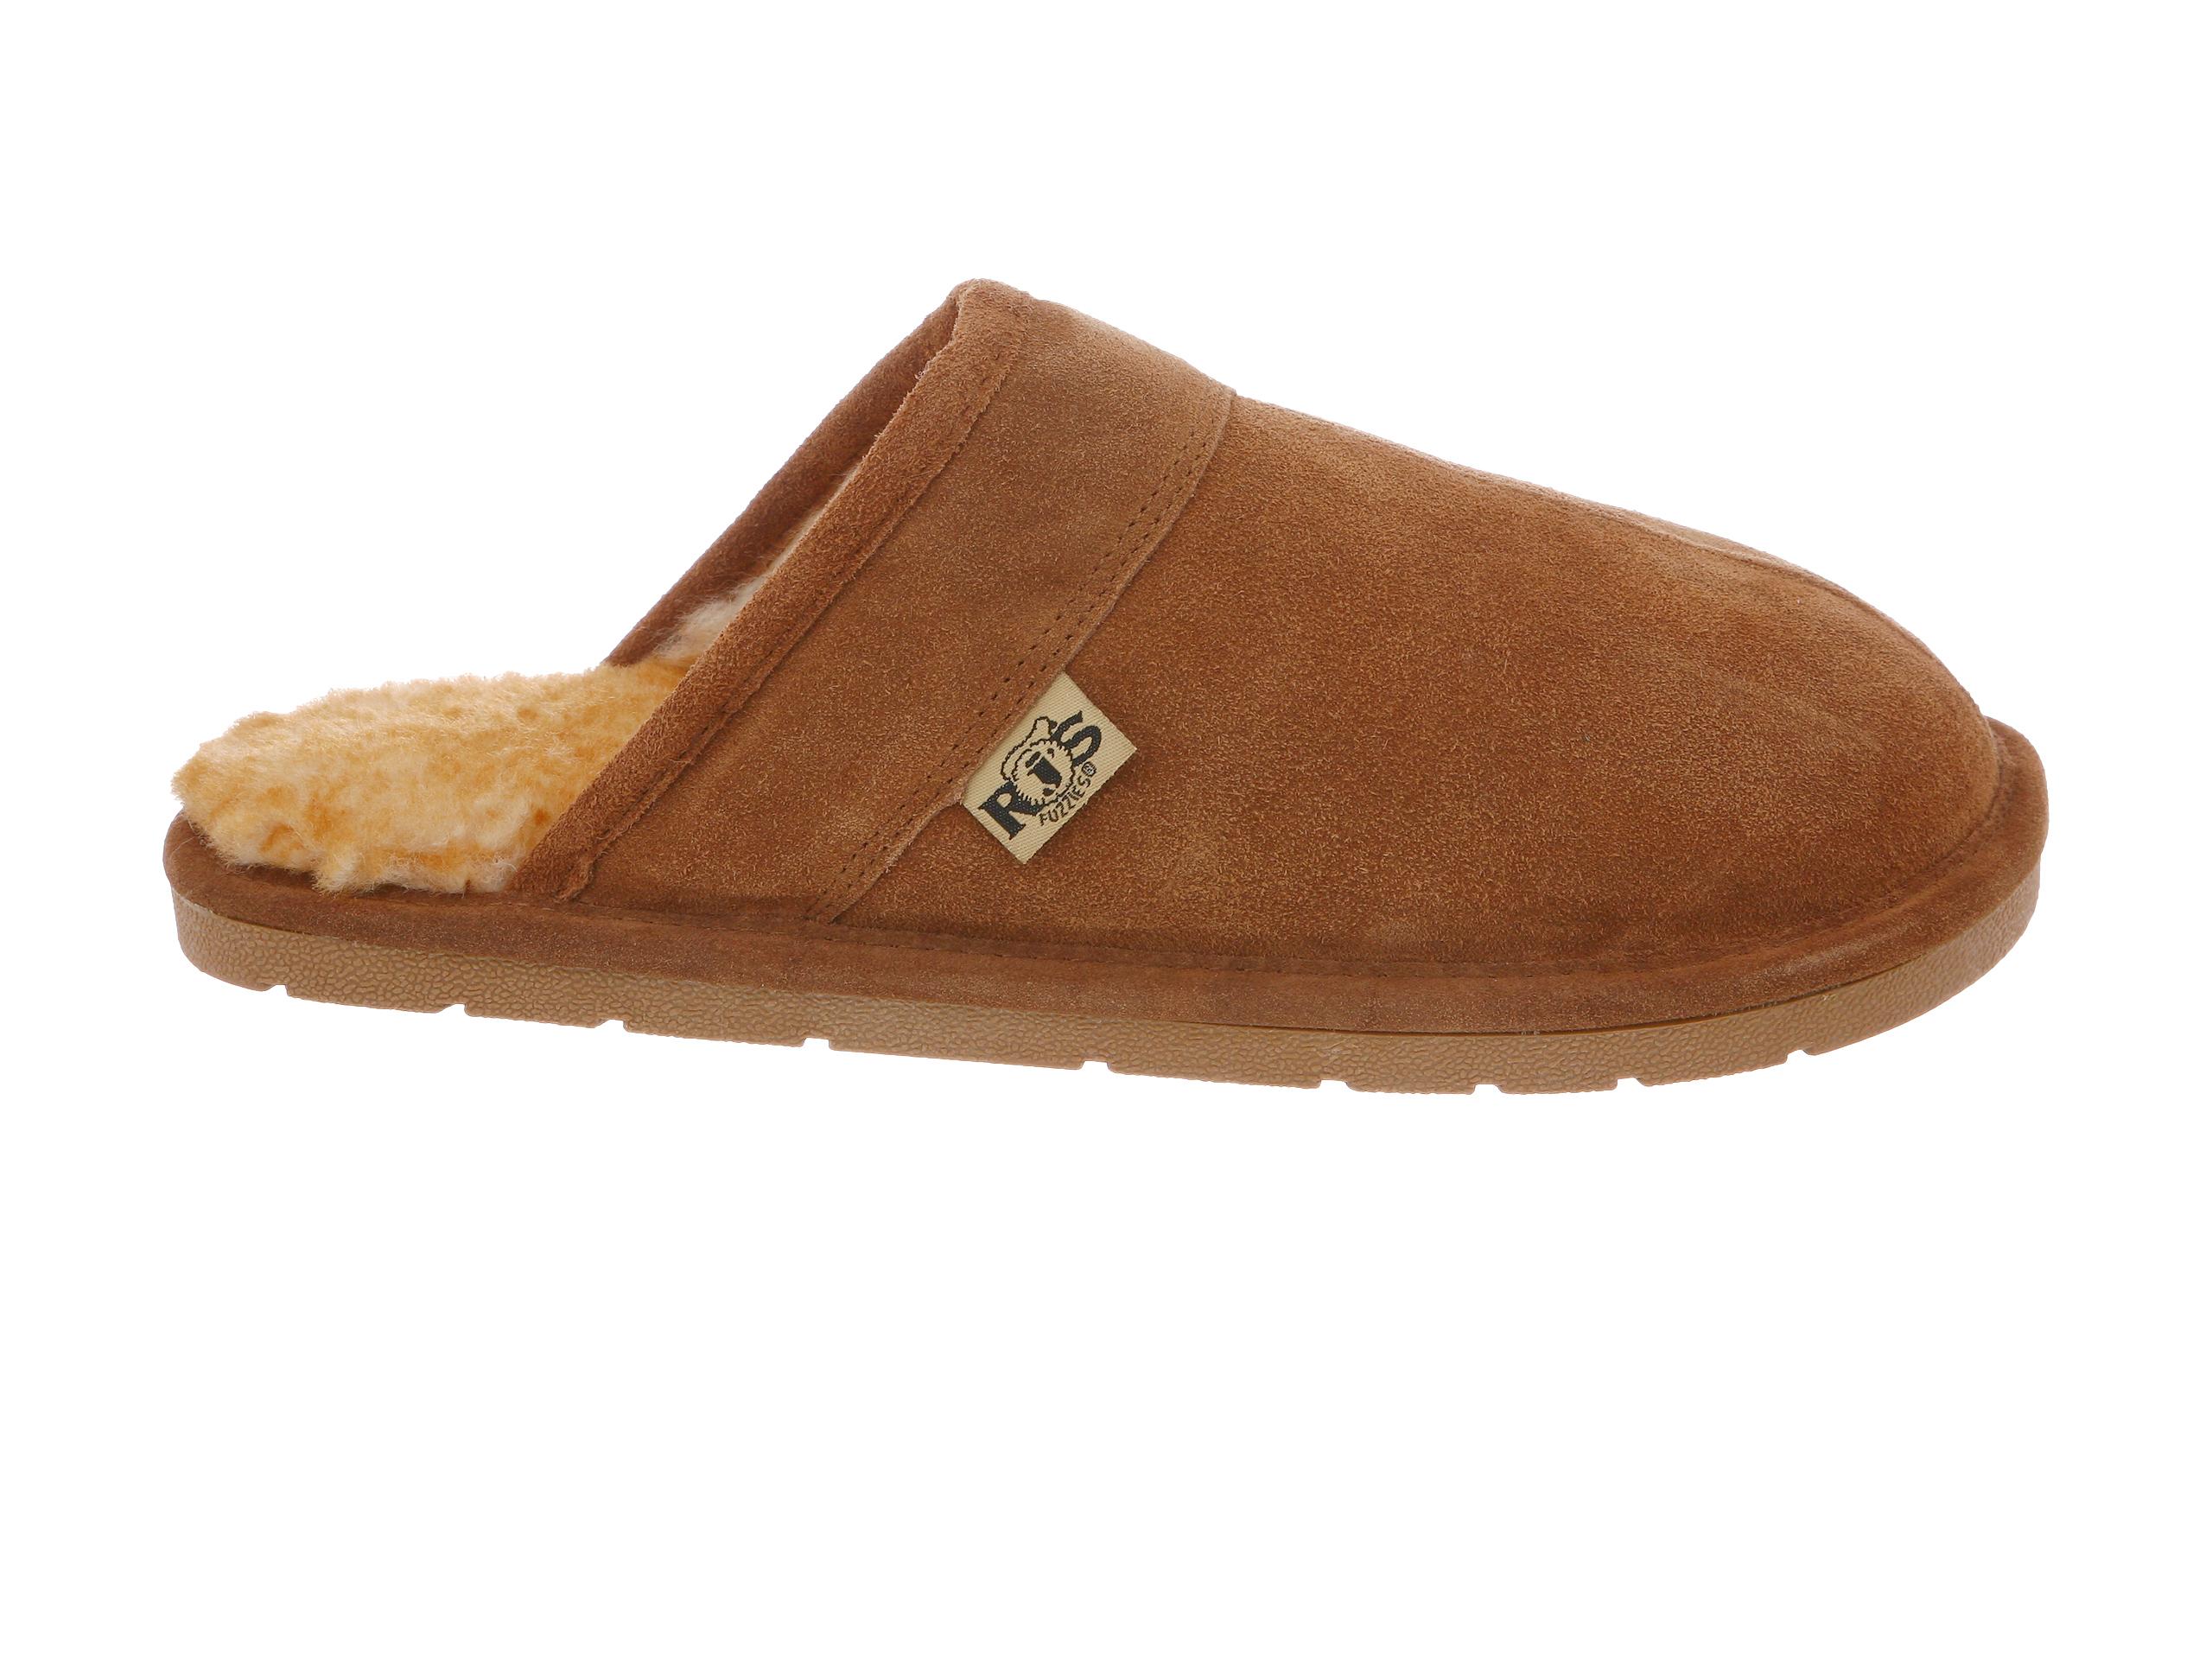 M, B Womens Rj/'s Fuzzies Sheepskin Booties Slippers Suede Chestnut Medium